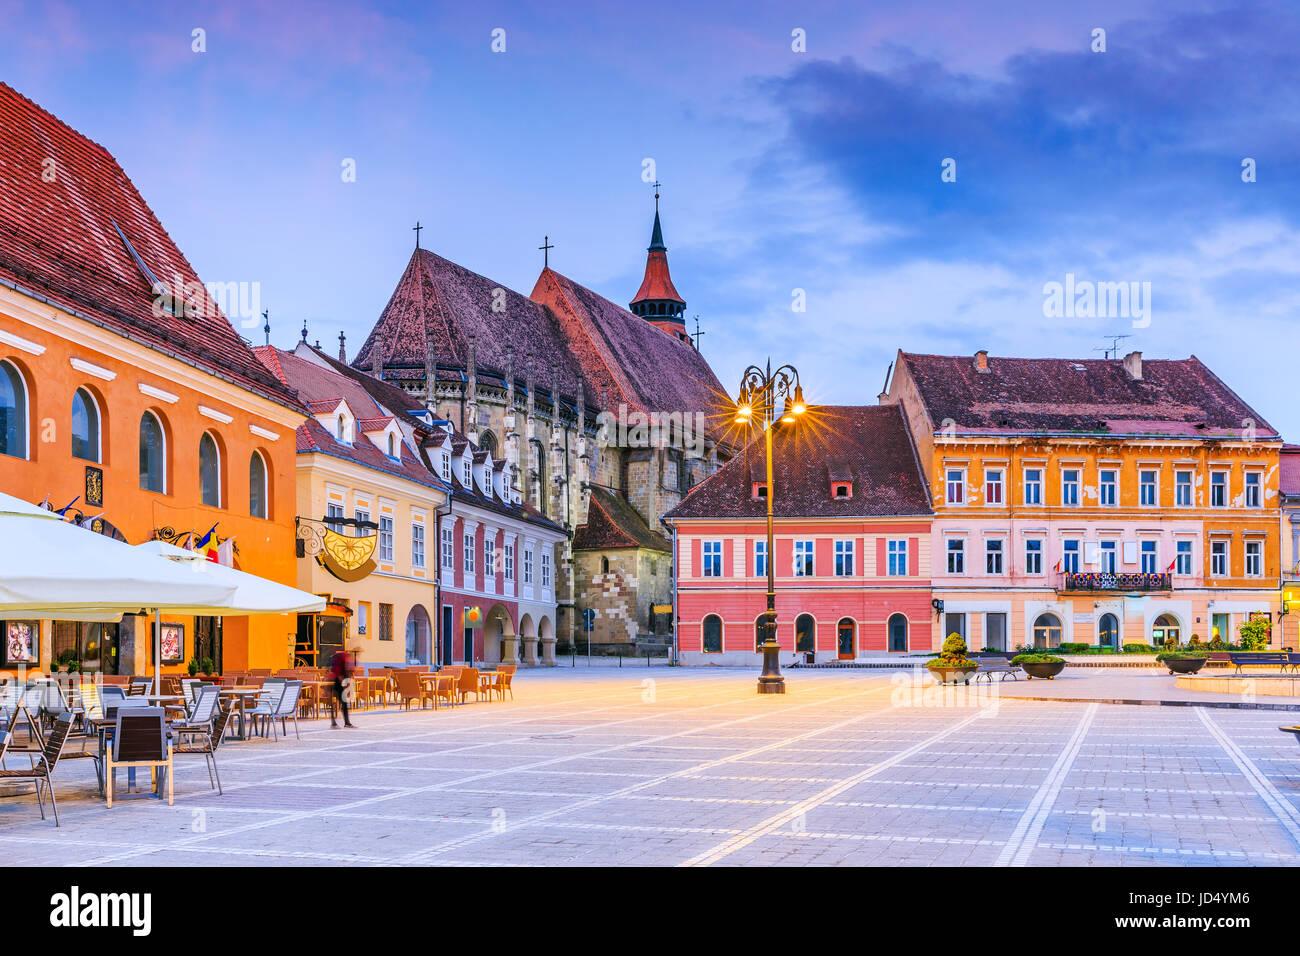 Brasov, Rumania. La iglesia negra en la principal plaza de la Ciudad Vieja. Imagen De Stock